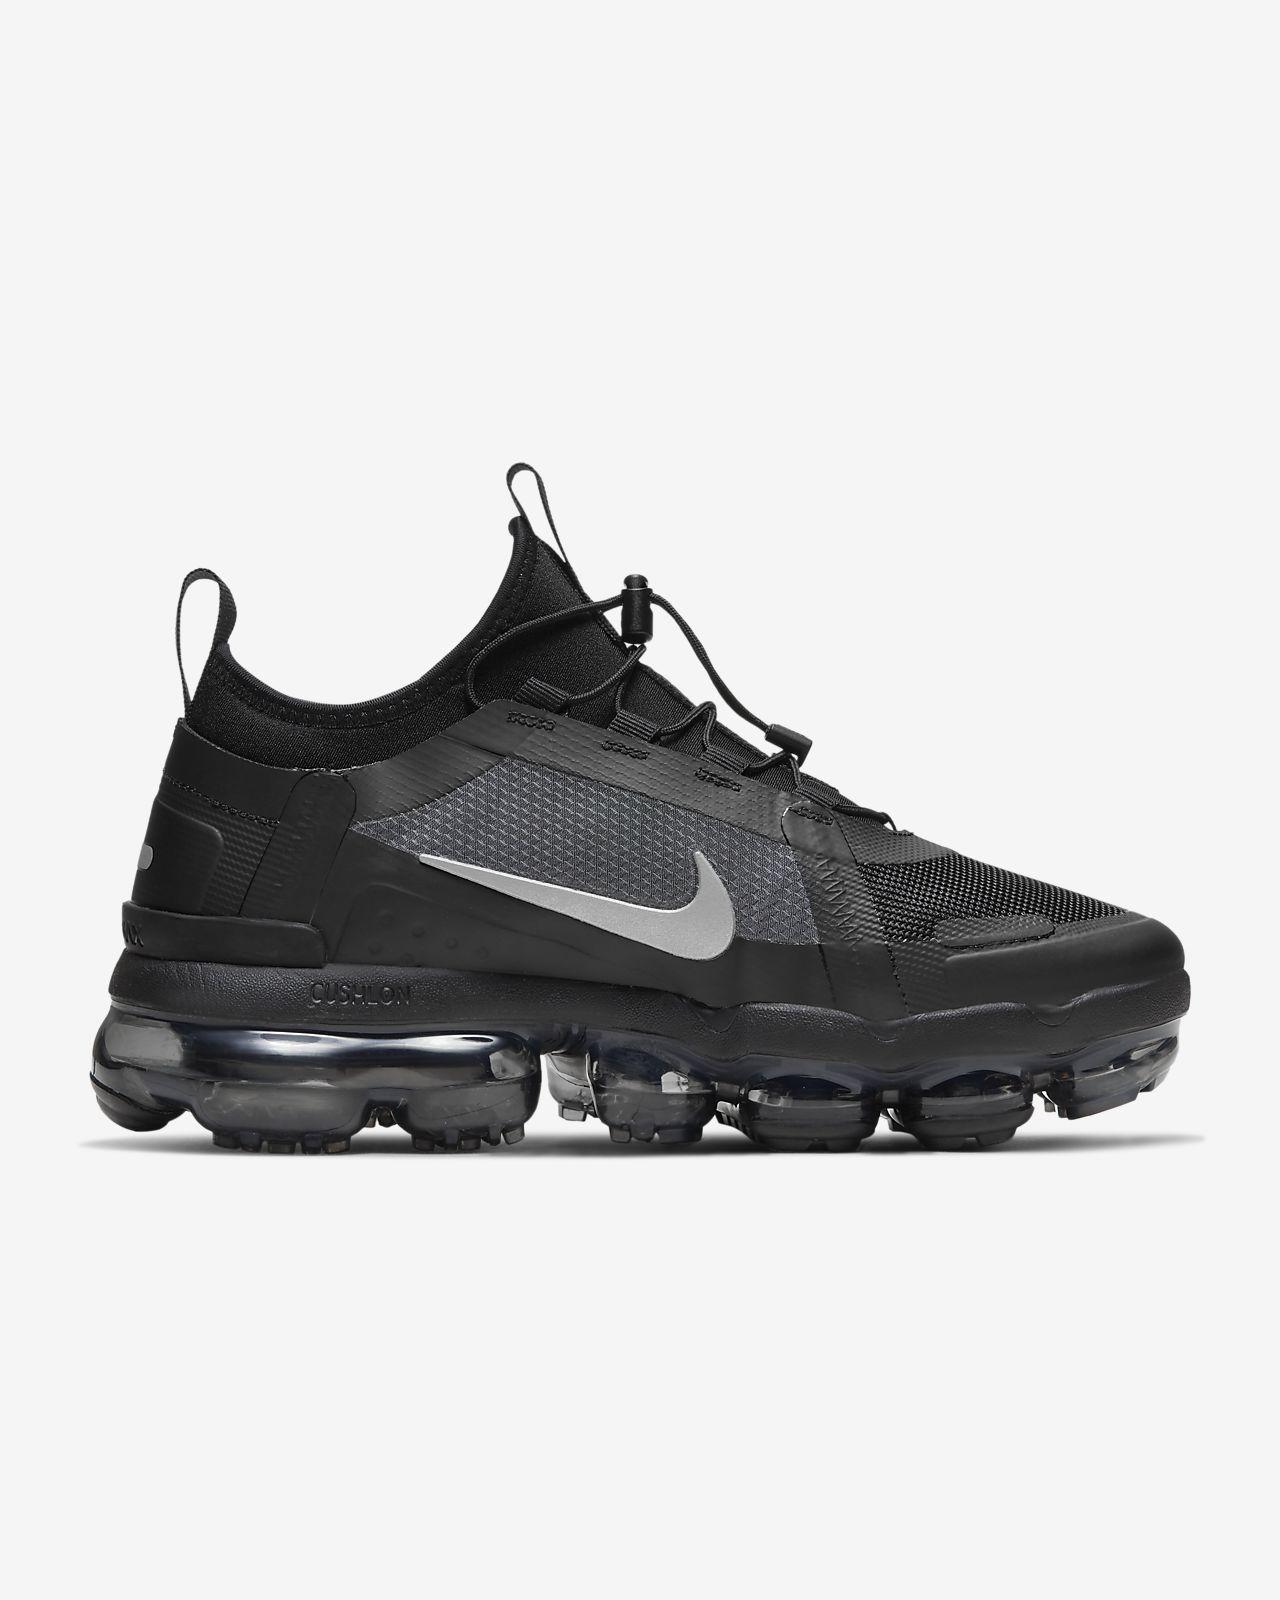 Calzado para hombre personalizado Nike Air VaporMax 2019 Utility By You